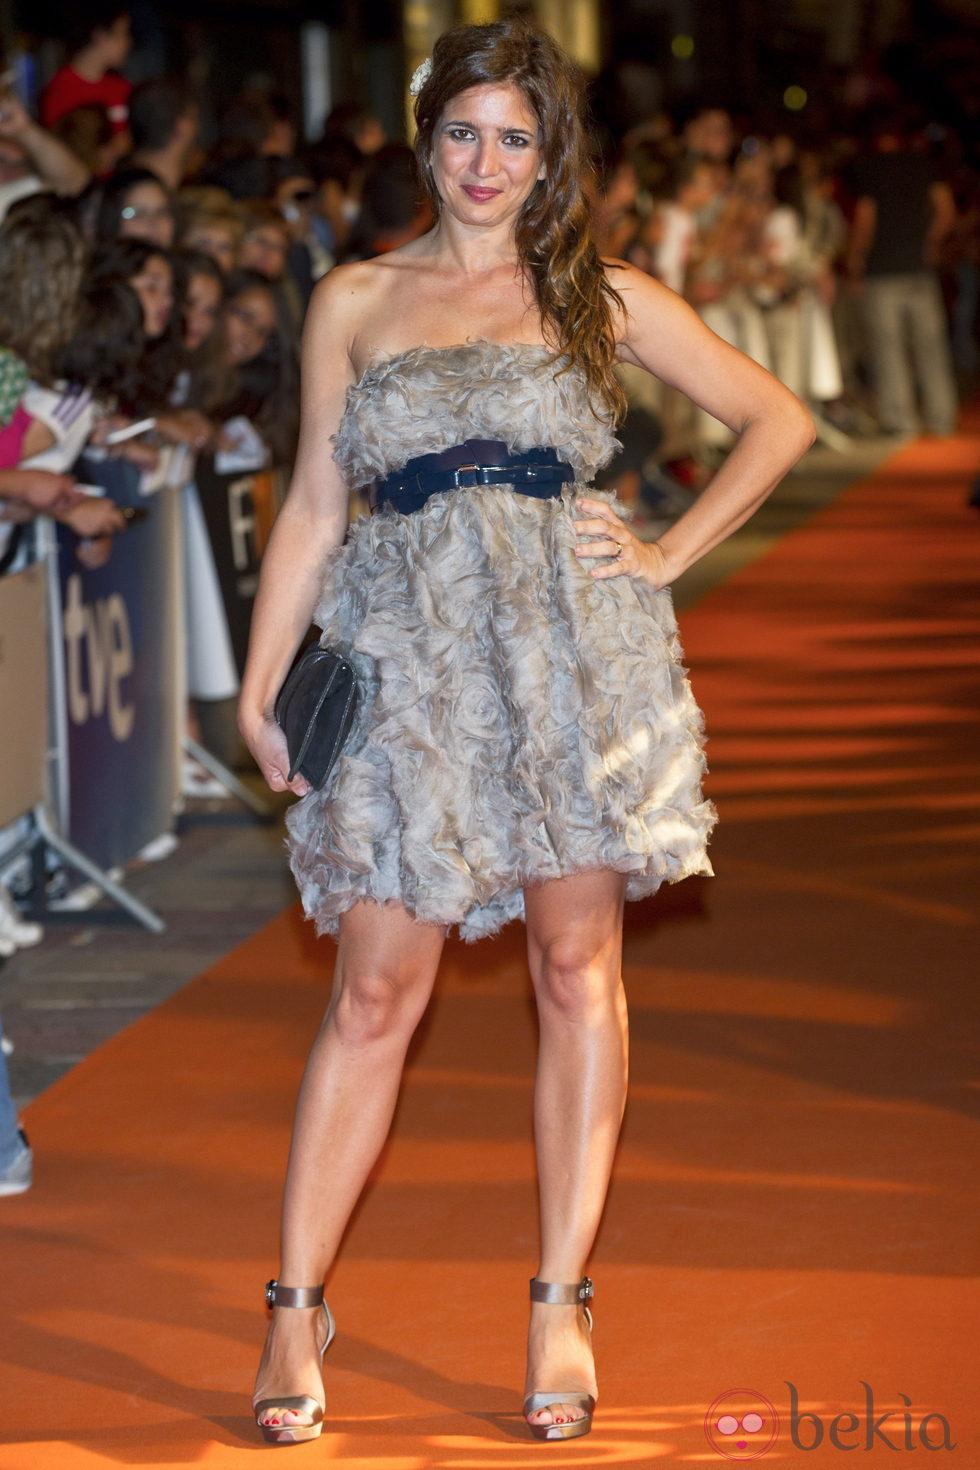 Lucía Jiménez, de Adolfo Domínguez, en el Festival de Televisión de Vitoria 2011